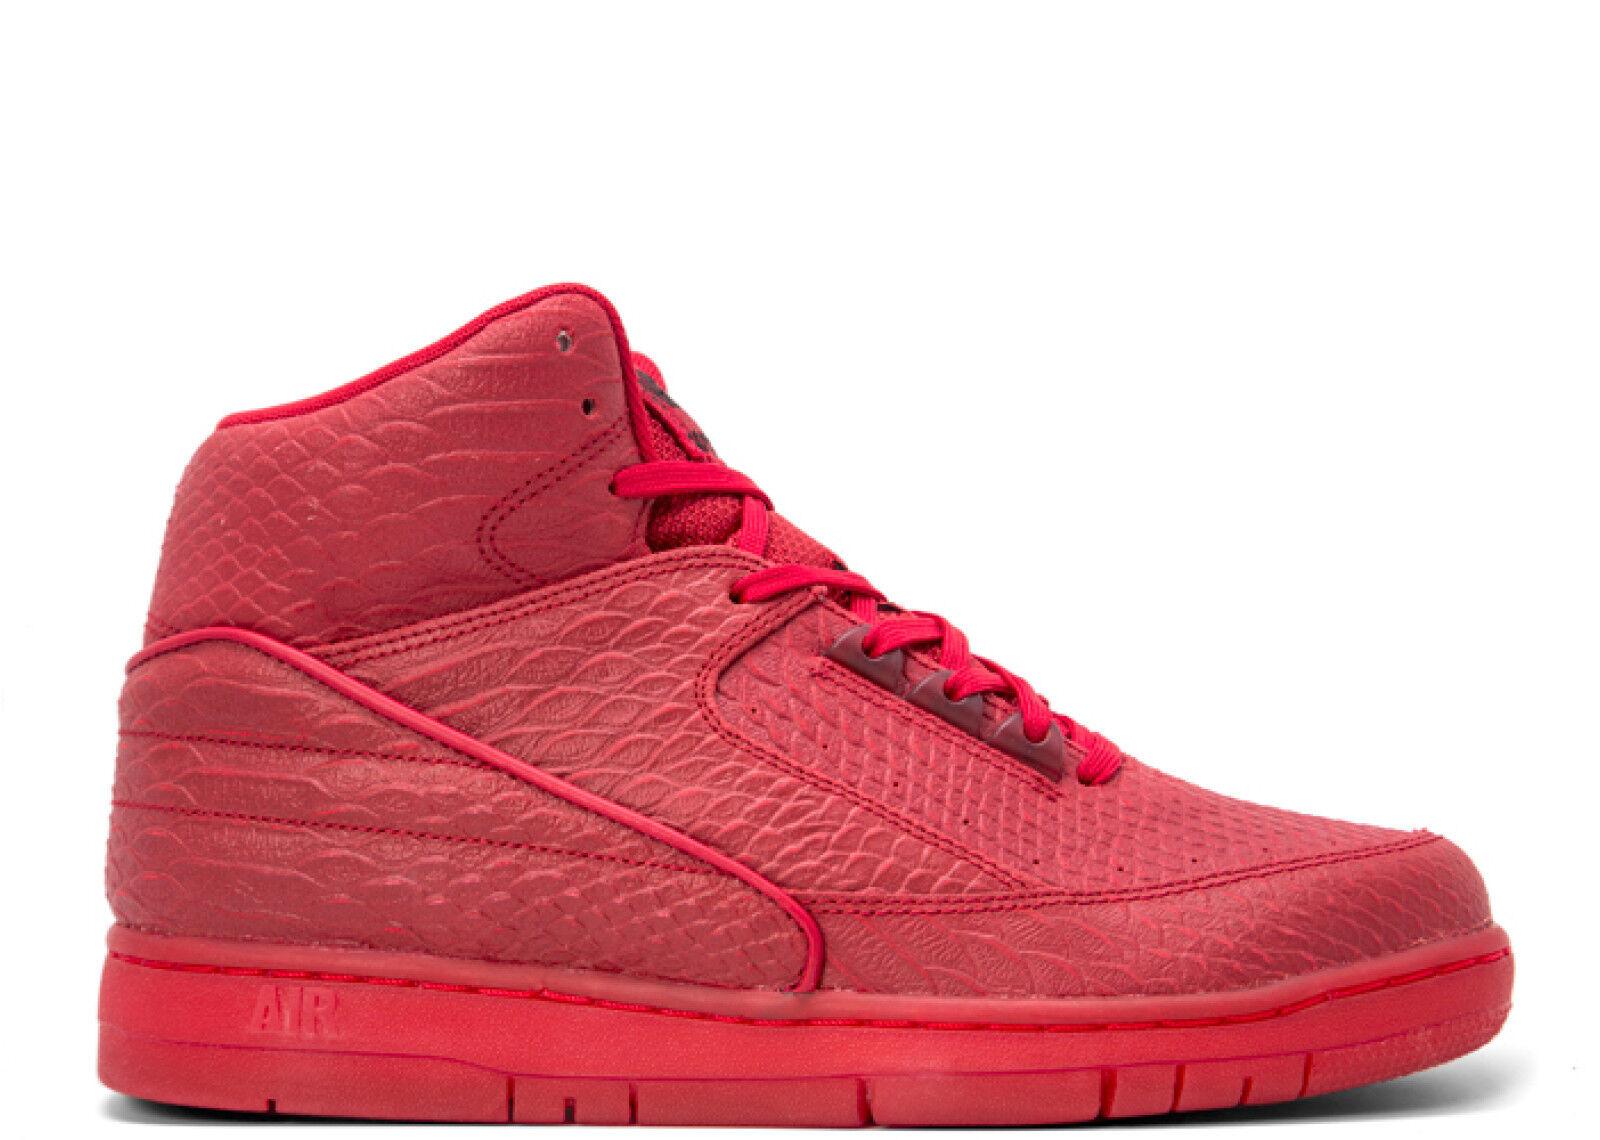 Nike Air Python Prm Gym Red October 2015 2015 2015 Mens Sneakers 705066-600 US 7 - b0d7de